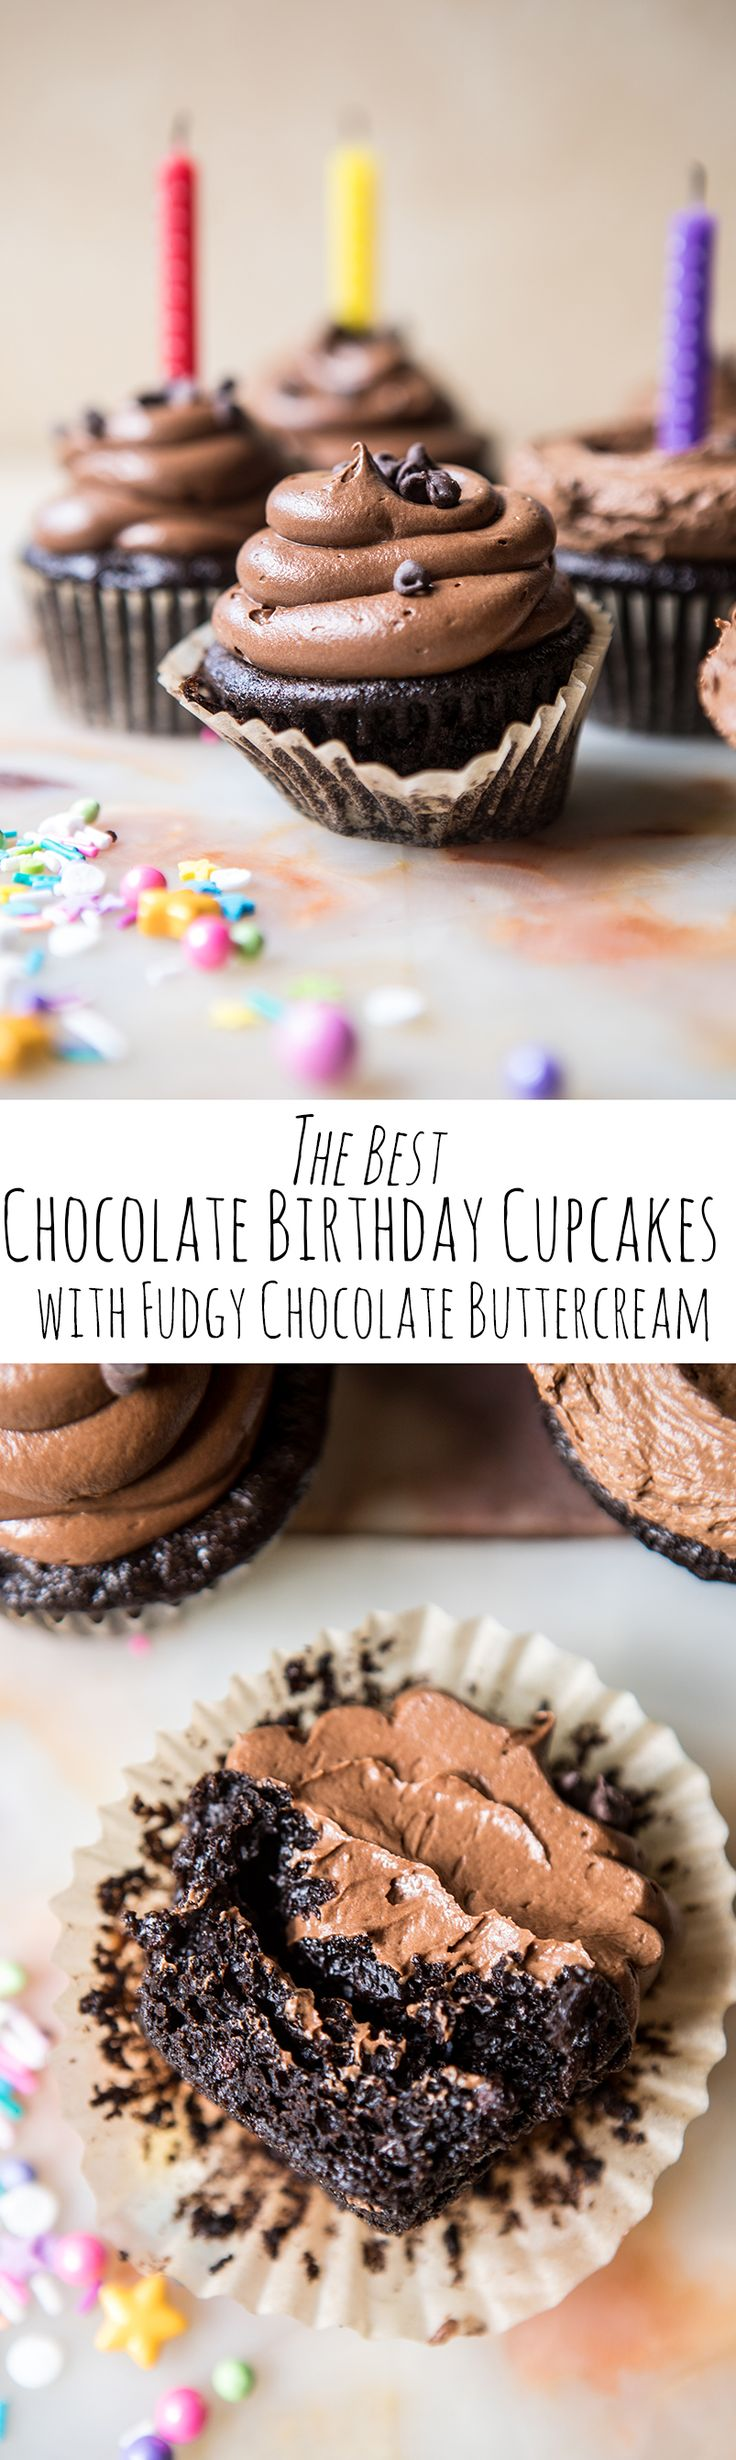 The Best Chocolate Birthday Cupcakes...with Fudgy Chocolate Buttercream   halfbakedharvest.com @hbharvest